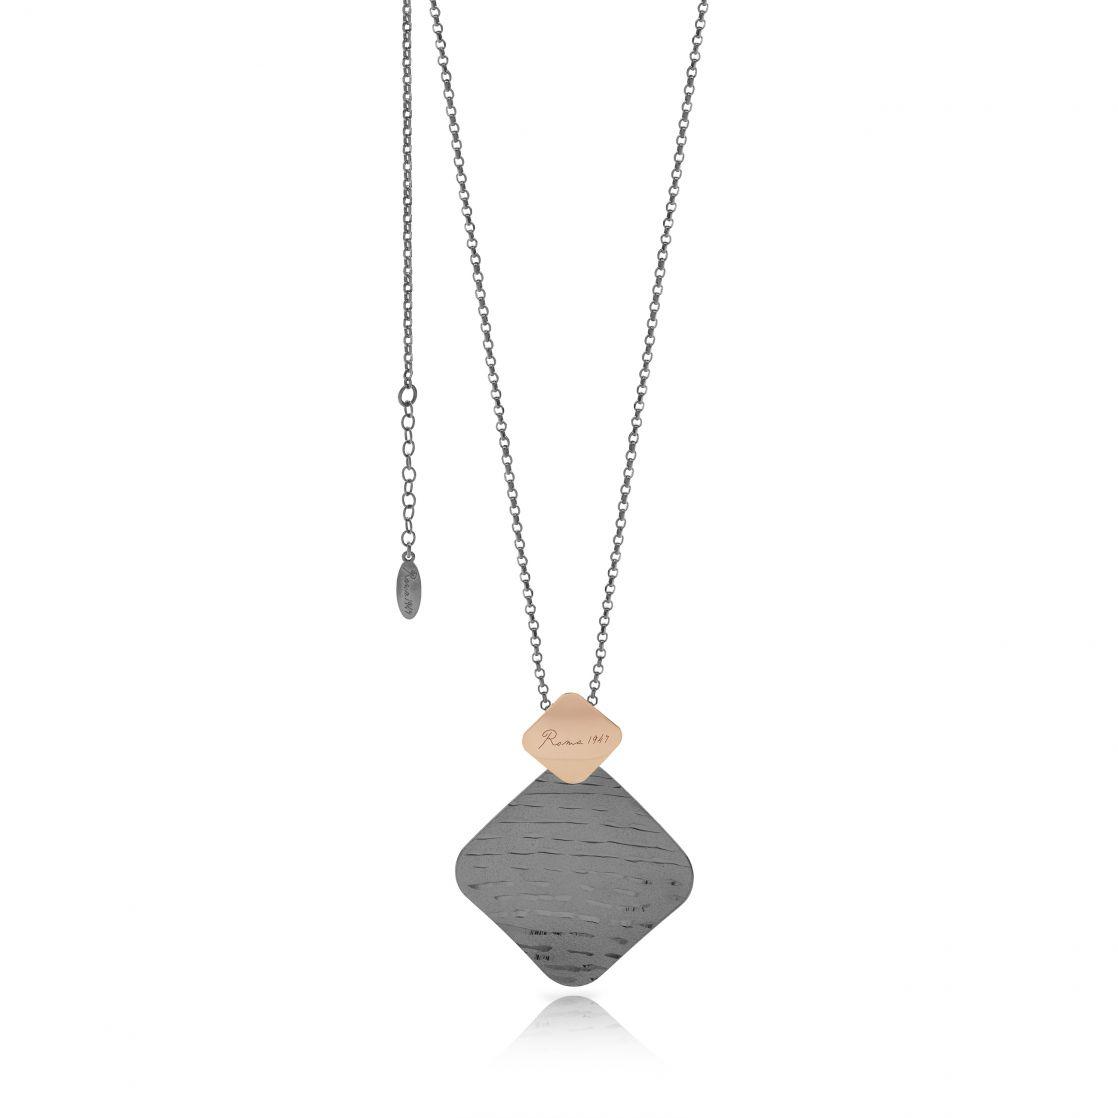 Handmade satin necklace